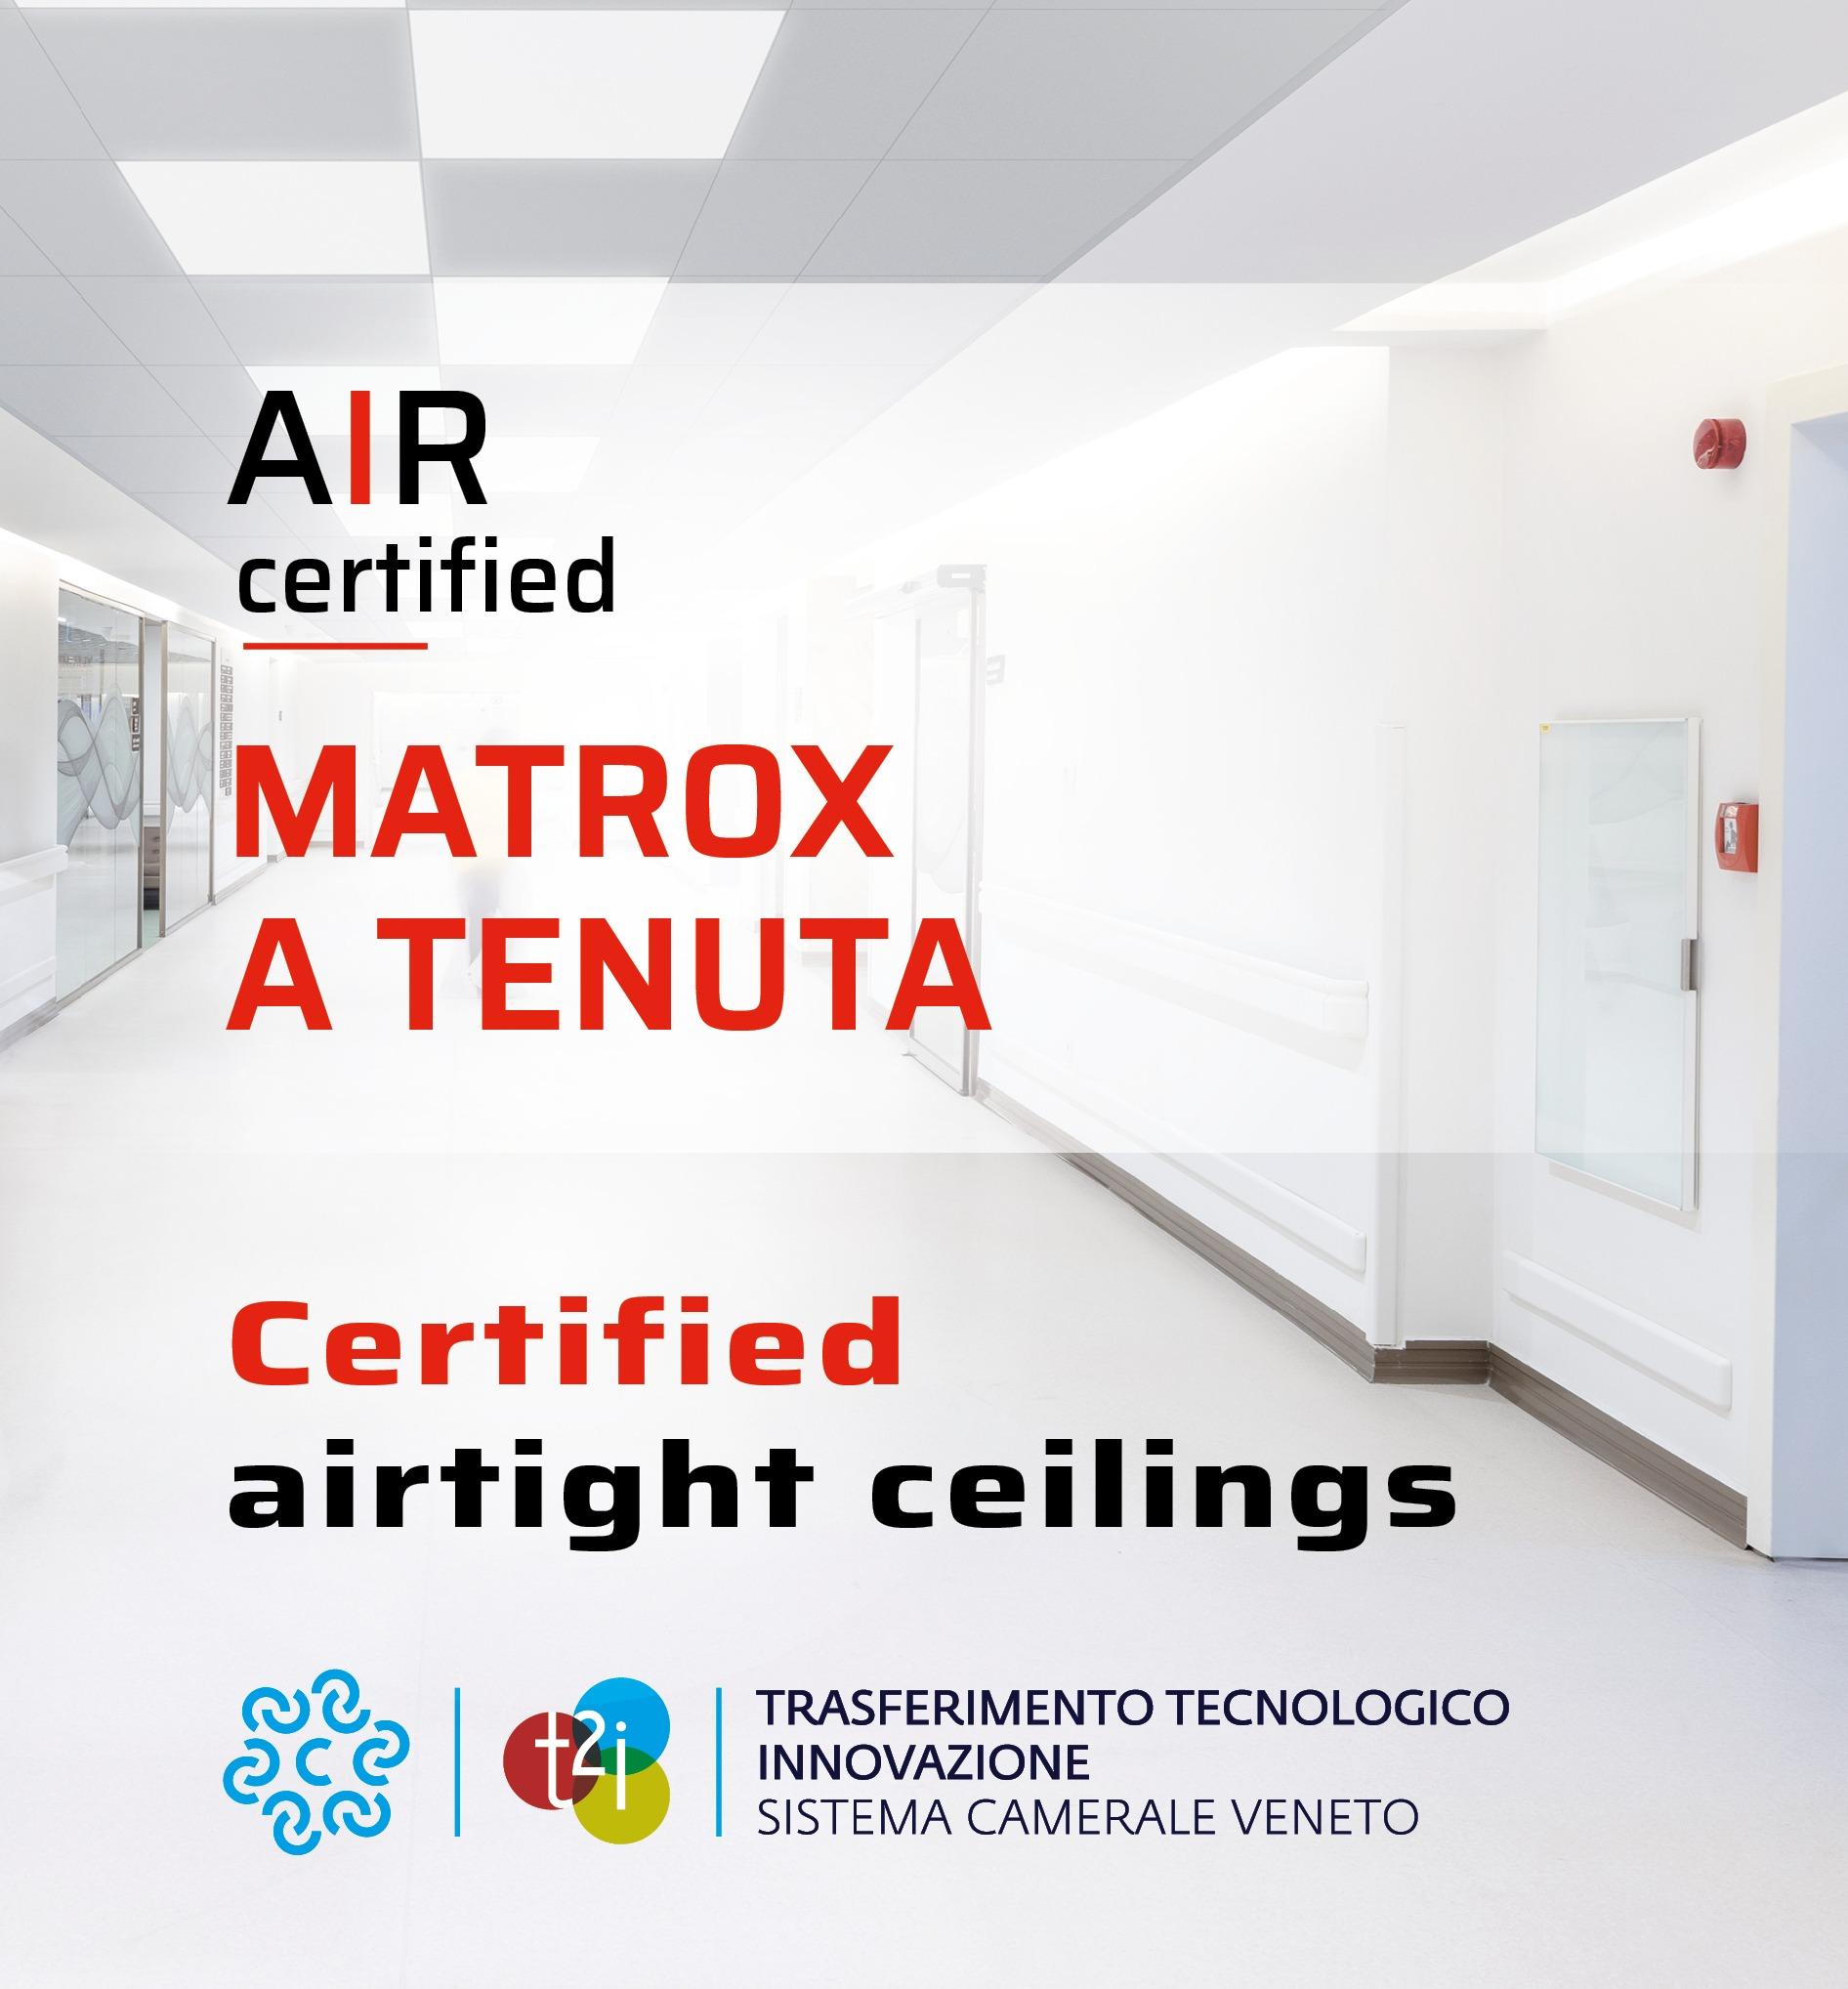 Atena Matrox, controsoffitti a tenuta, Airtight ceilings